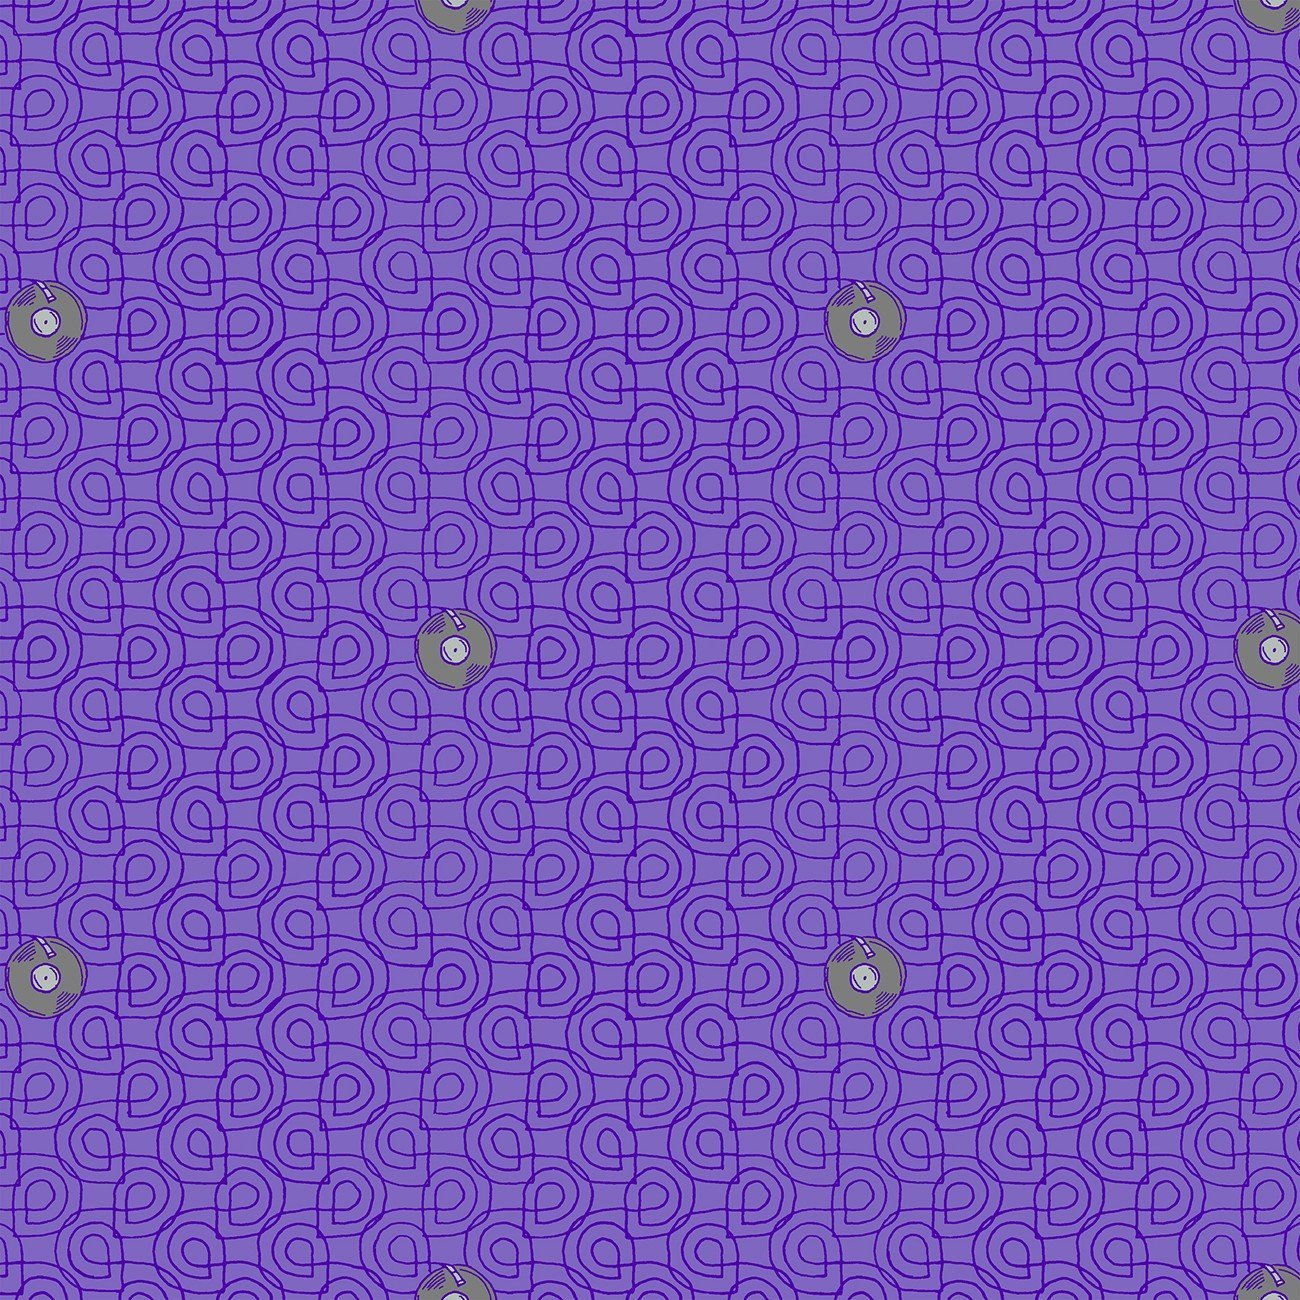 Favorite  Things Hyacinth 52157-8